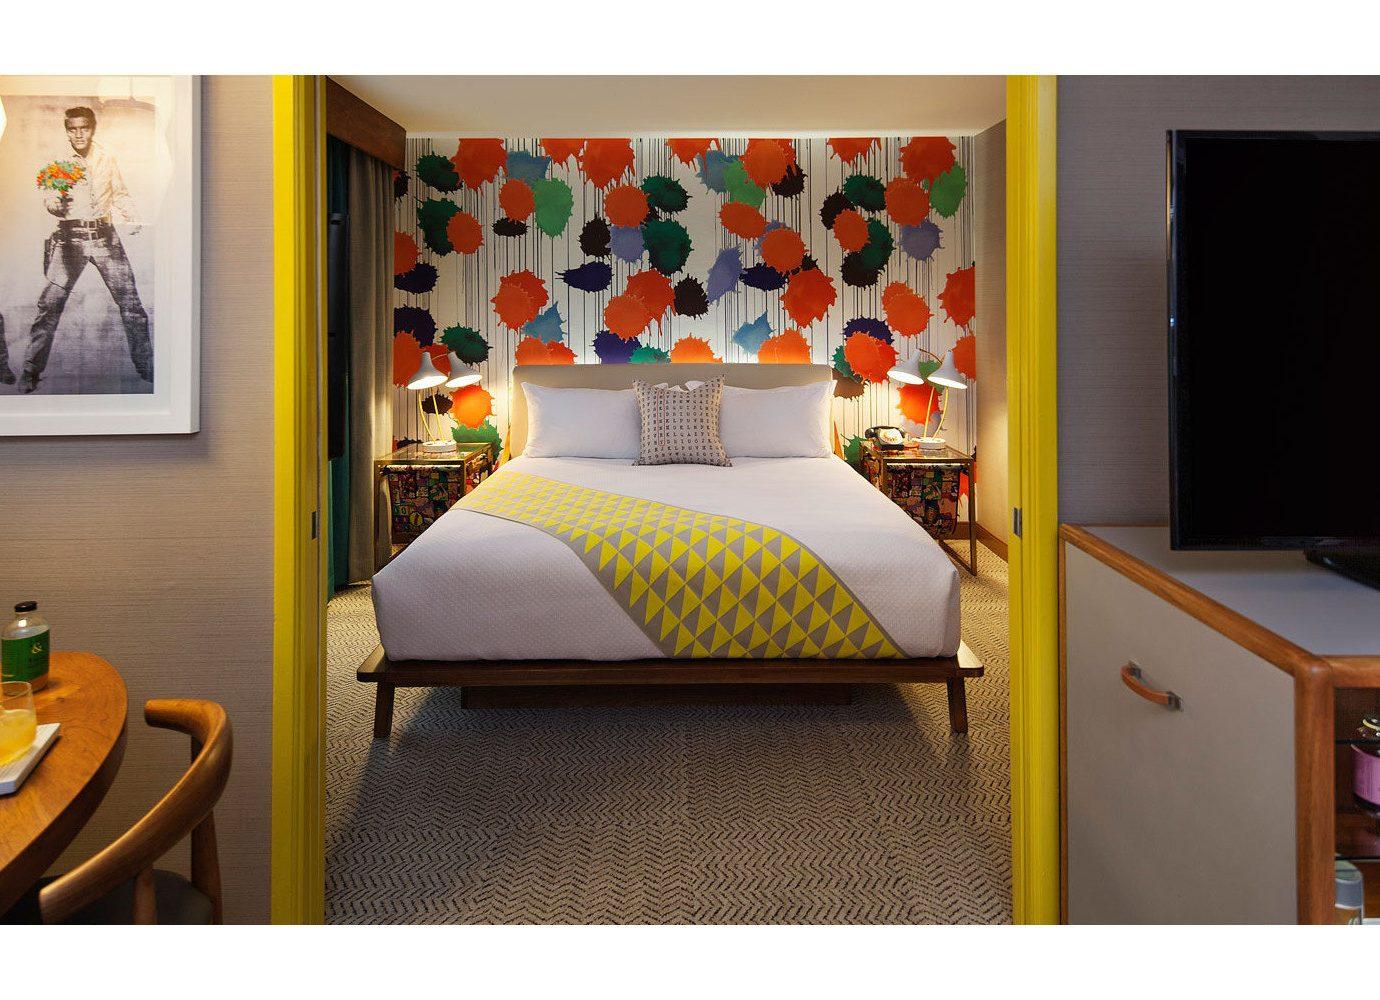 Hotels wall indoor room property living room Bedroom yellow furniture interior design bed bed sheet home Suite modern art Design